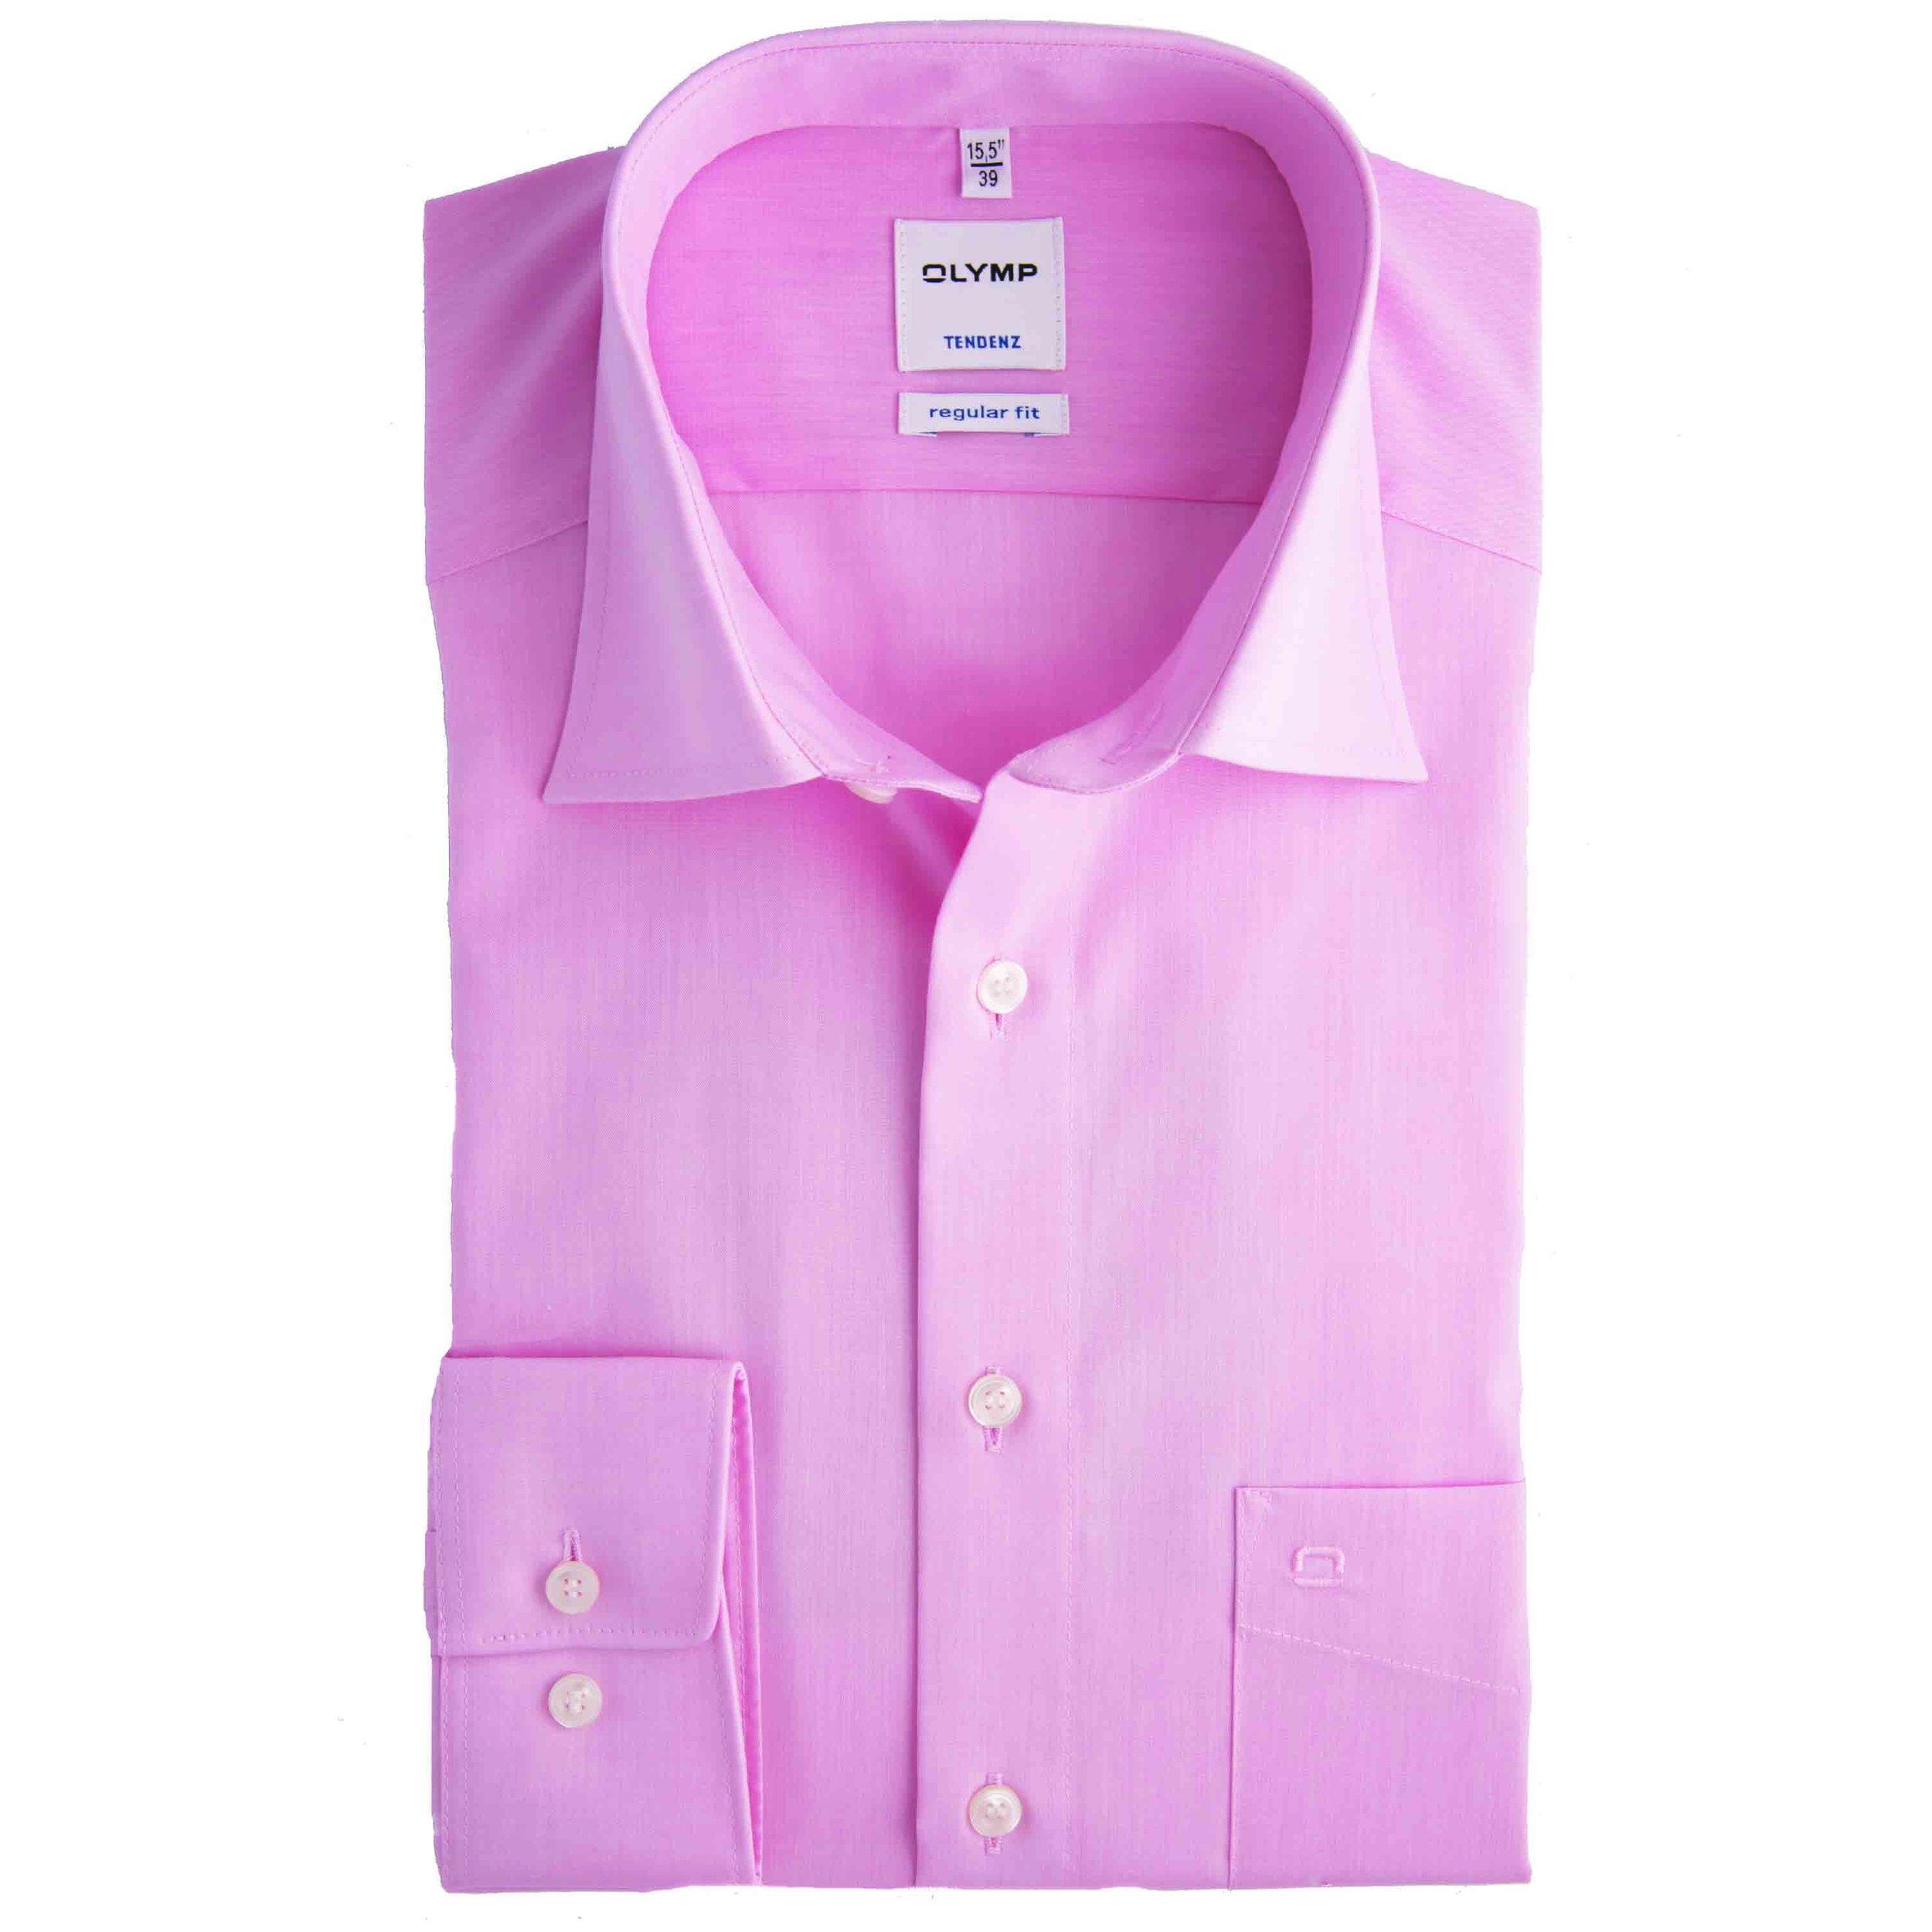 Pink Olymp Shirt.jpg